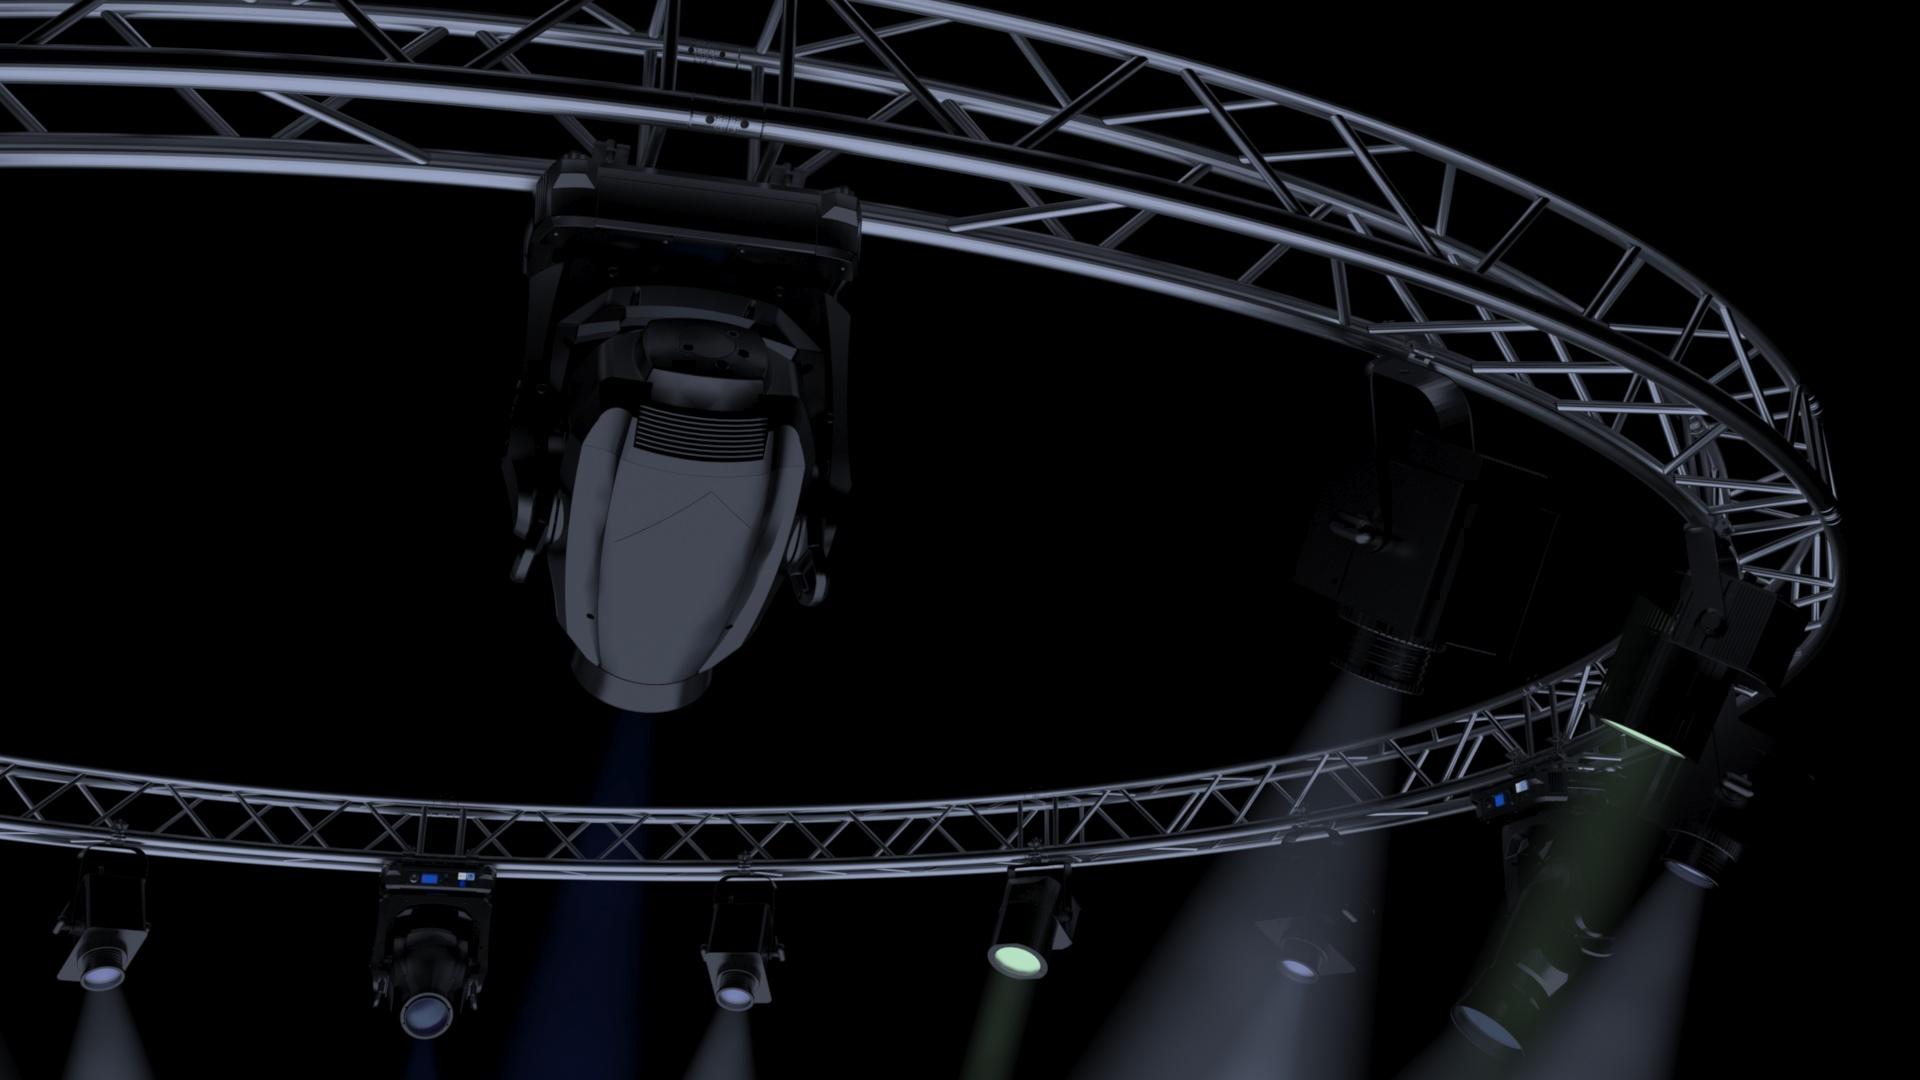 41-04-CircleSquareTruss700cm-StageLights